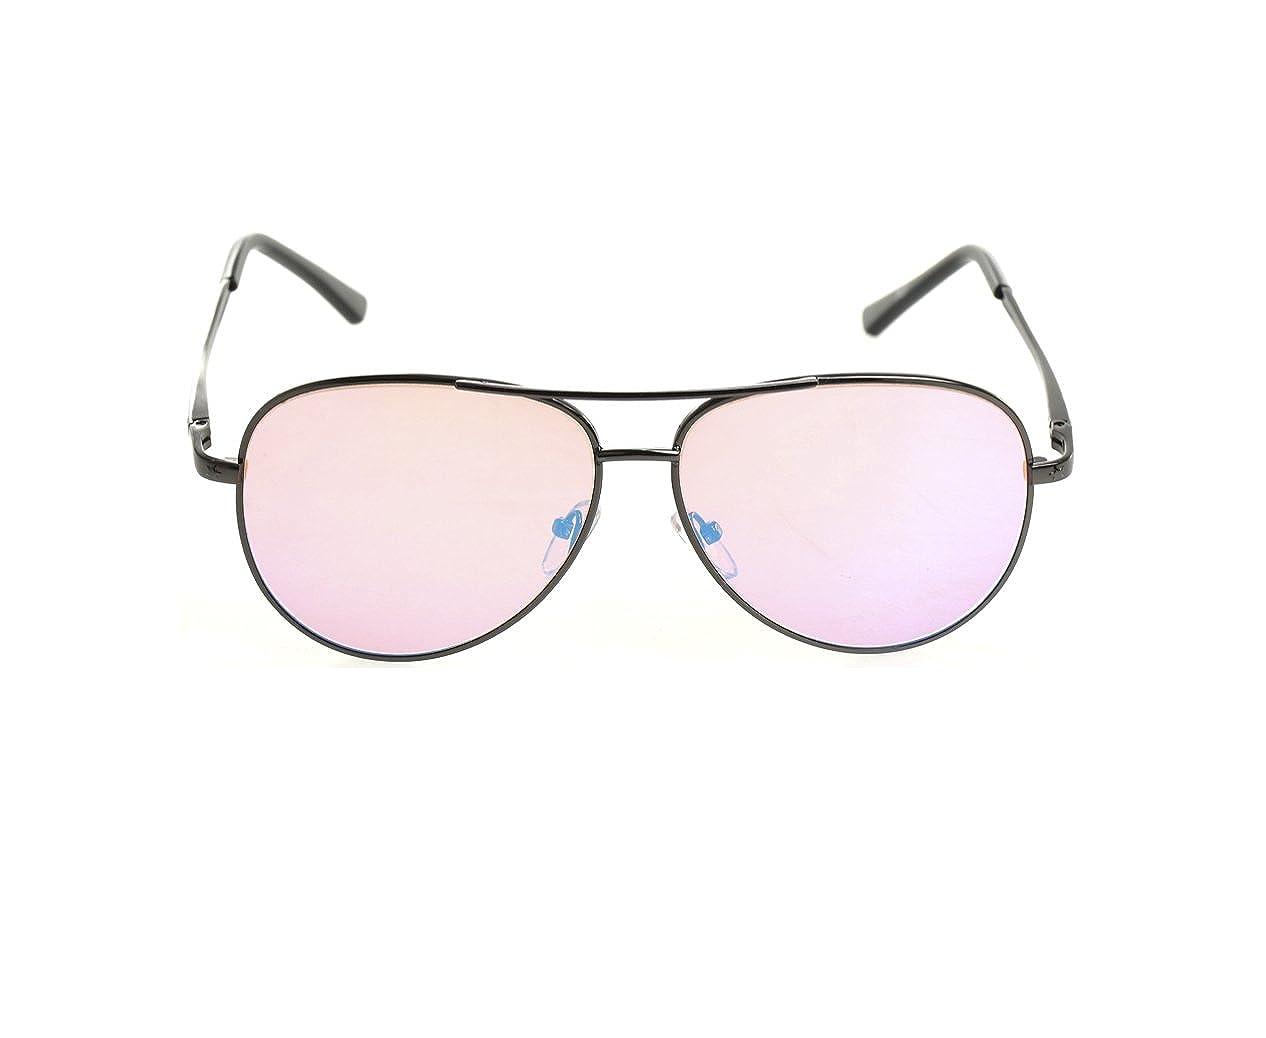 5a5eda1f63 Pilestone Color Blind Glasses TP-006 Aviators for Red Green Color Blindness